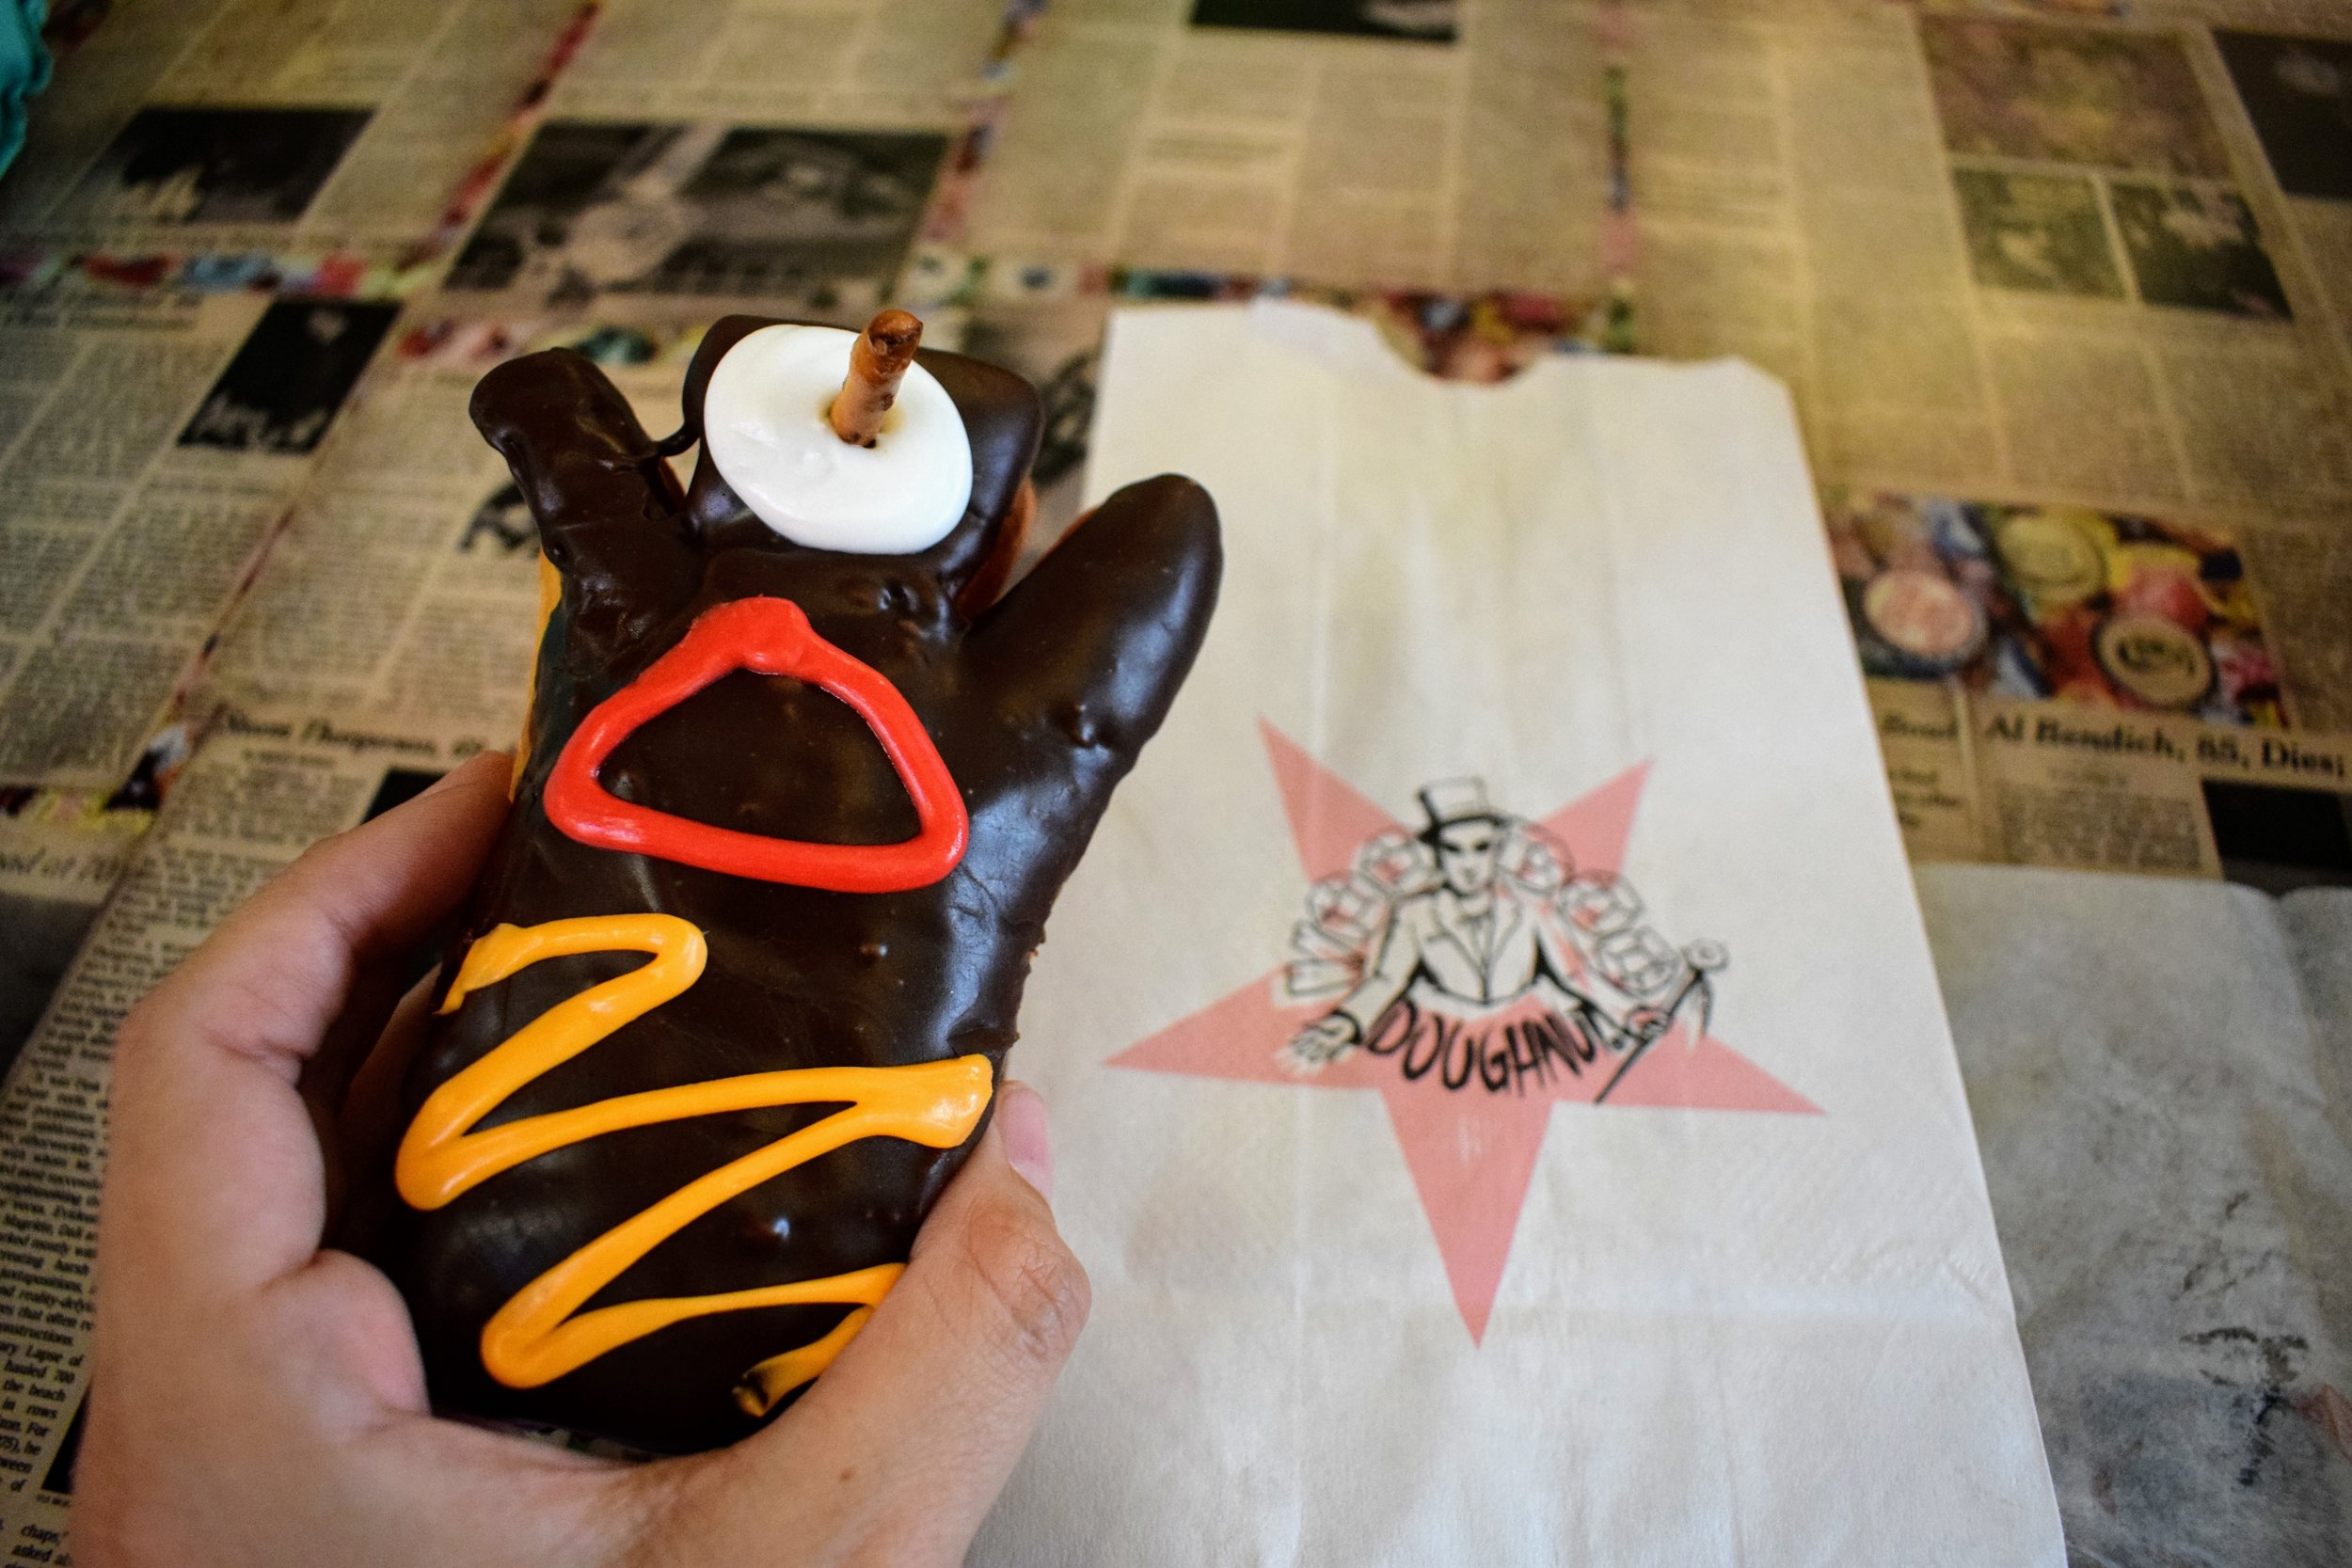 The classic namesake doughnut that I ate at Voodoo Doughnuts in Austin.